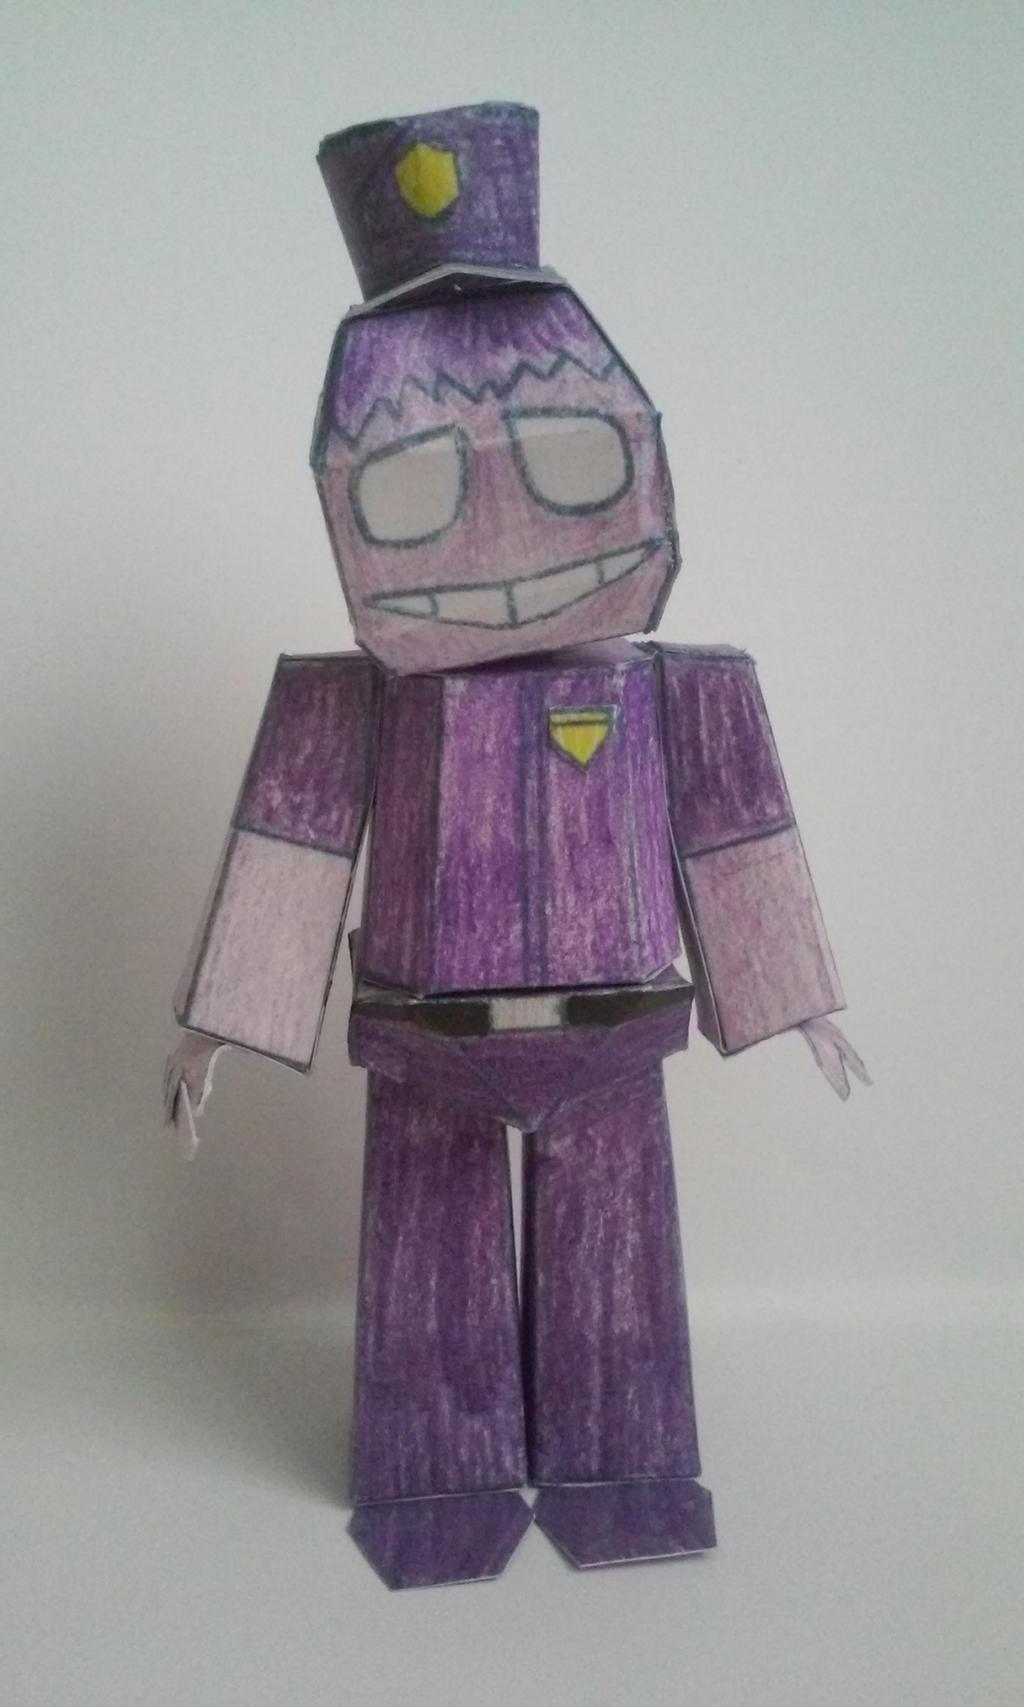 Fnaf papercraft purple guy im2 by paperlist on deviantart